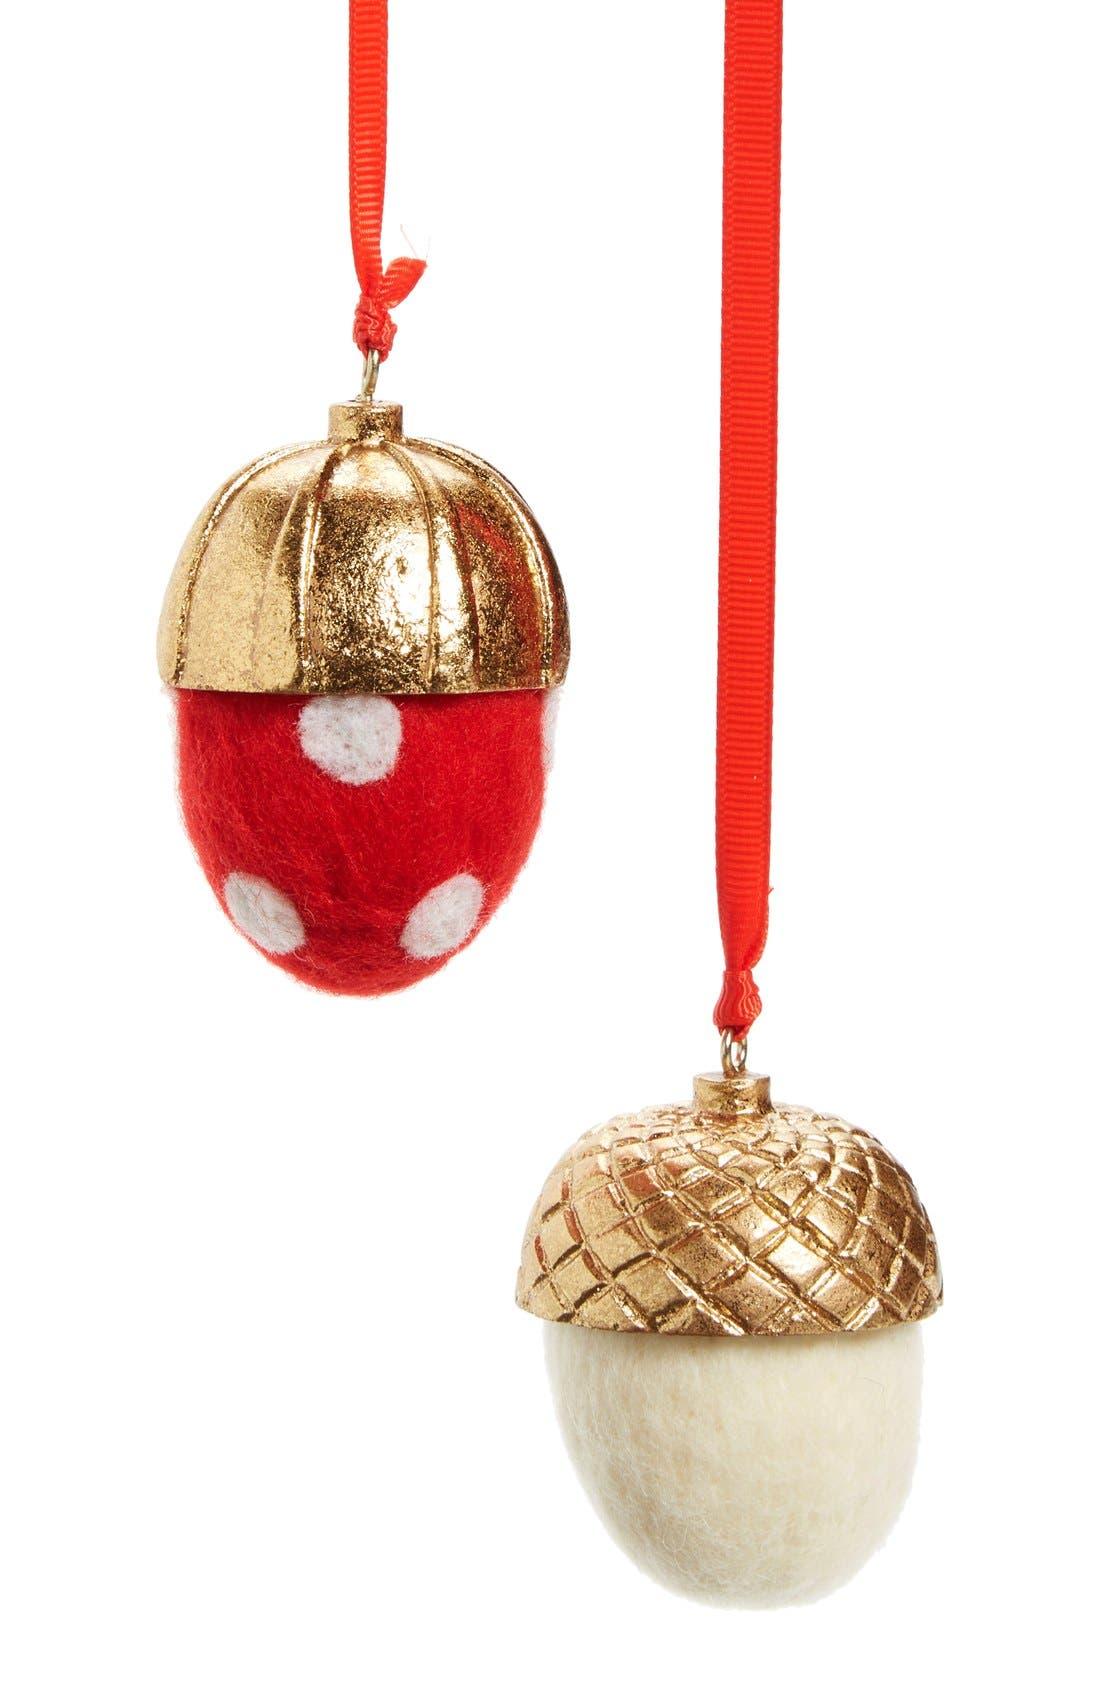 Nordstrom at Home Set of 2 Acorn Ornaments